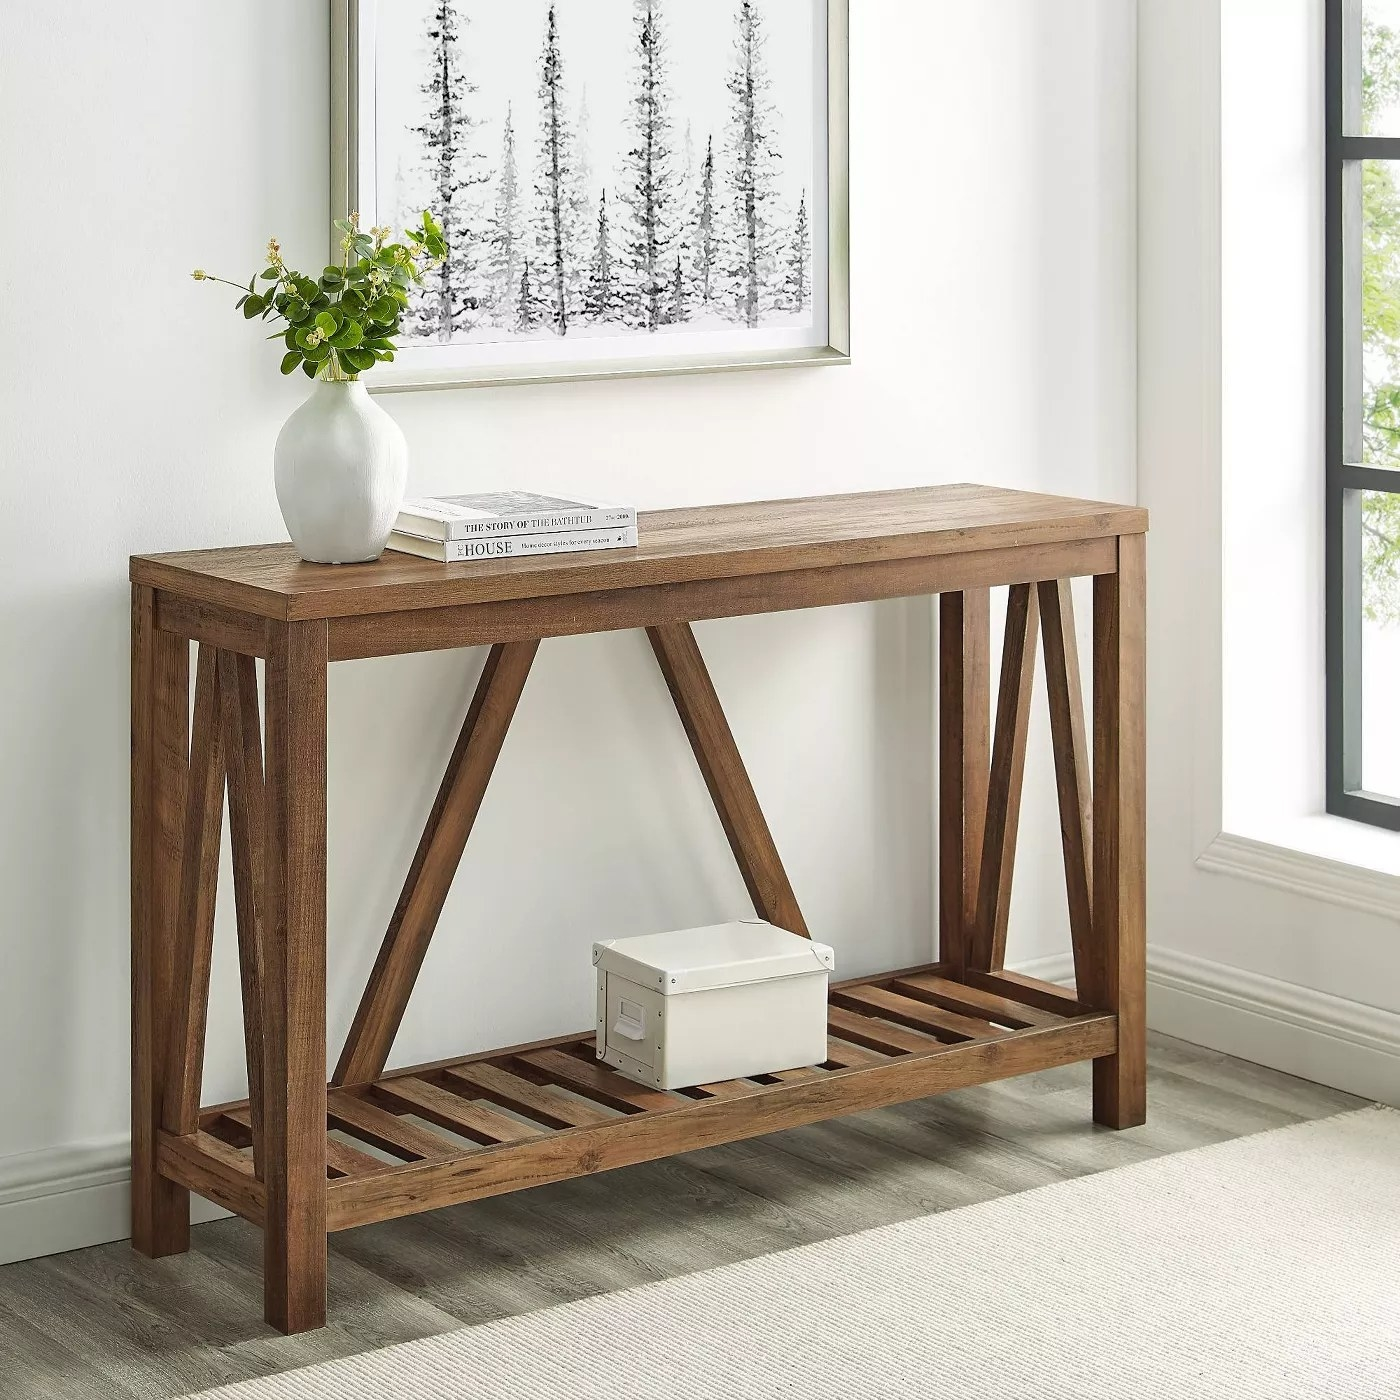 The rustic oak console table